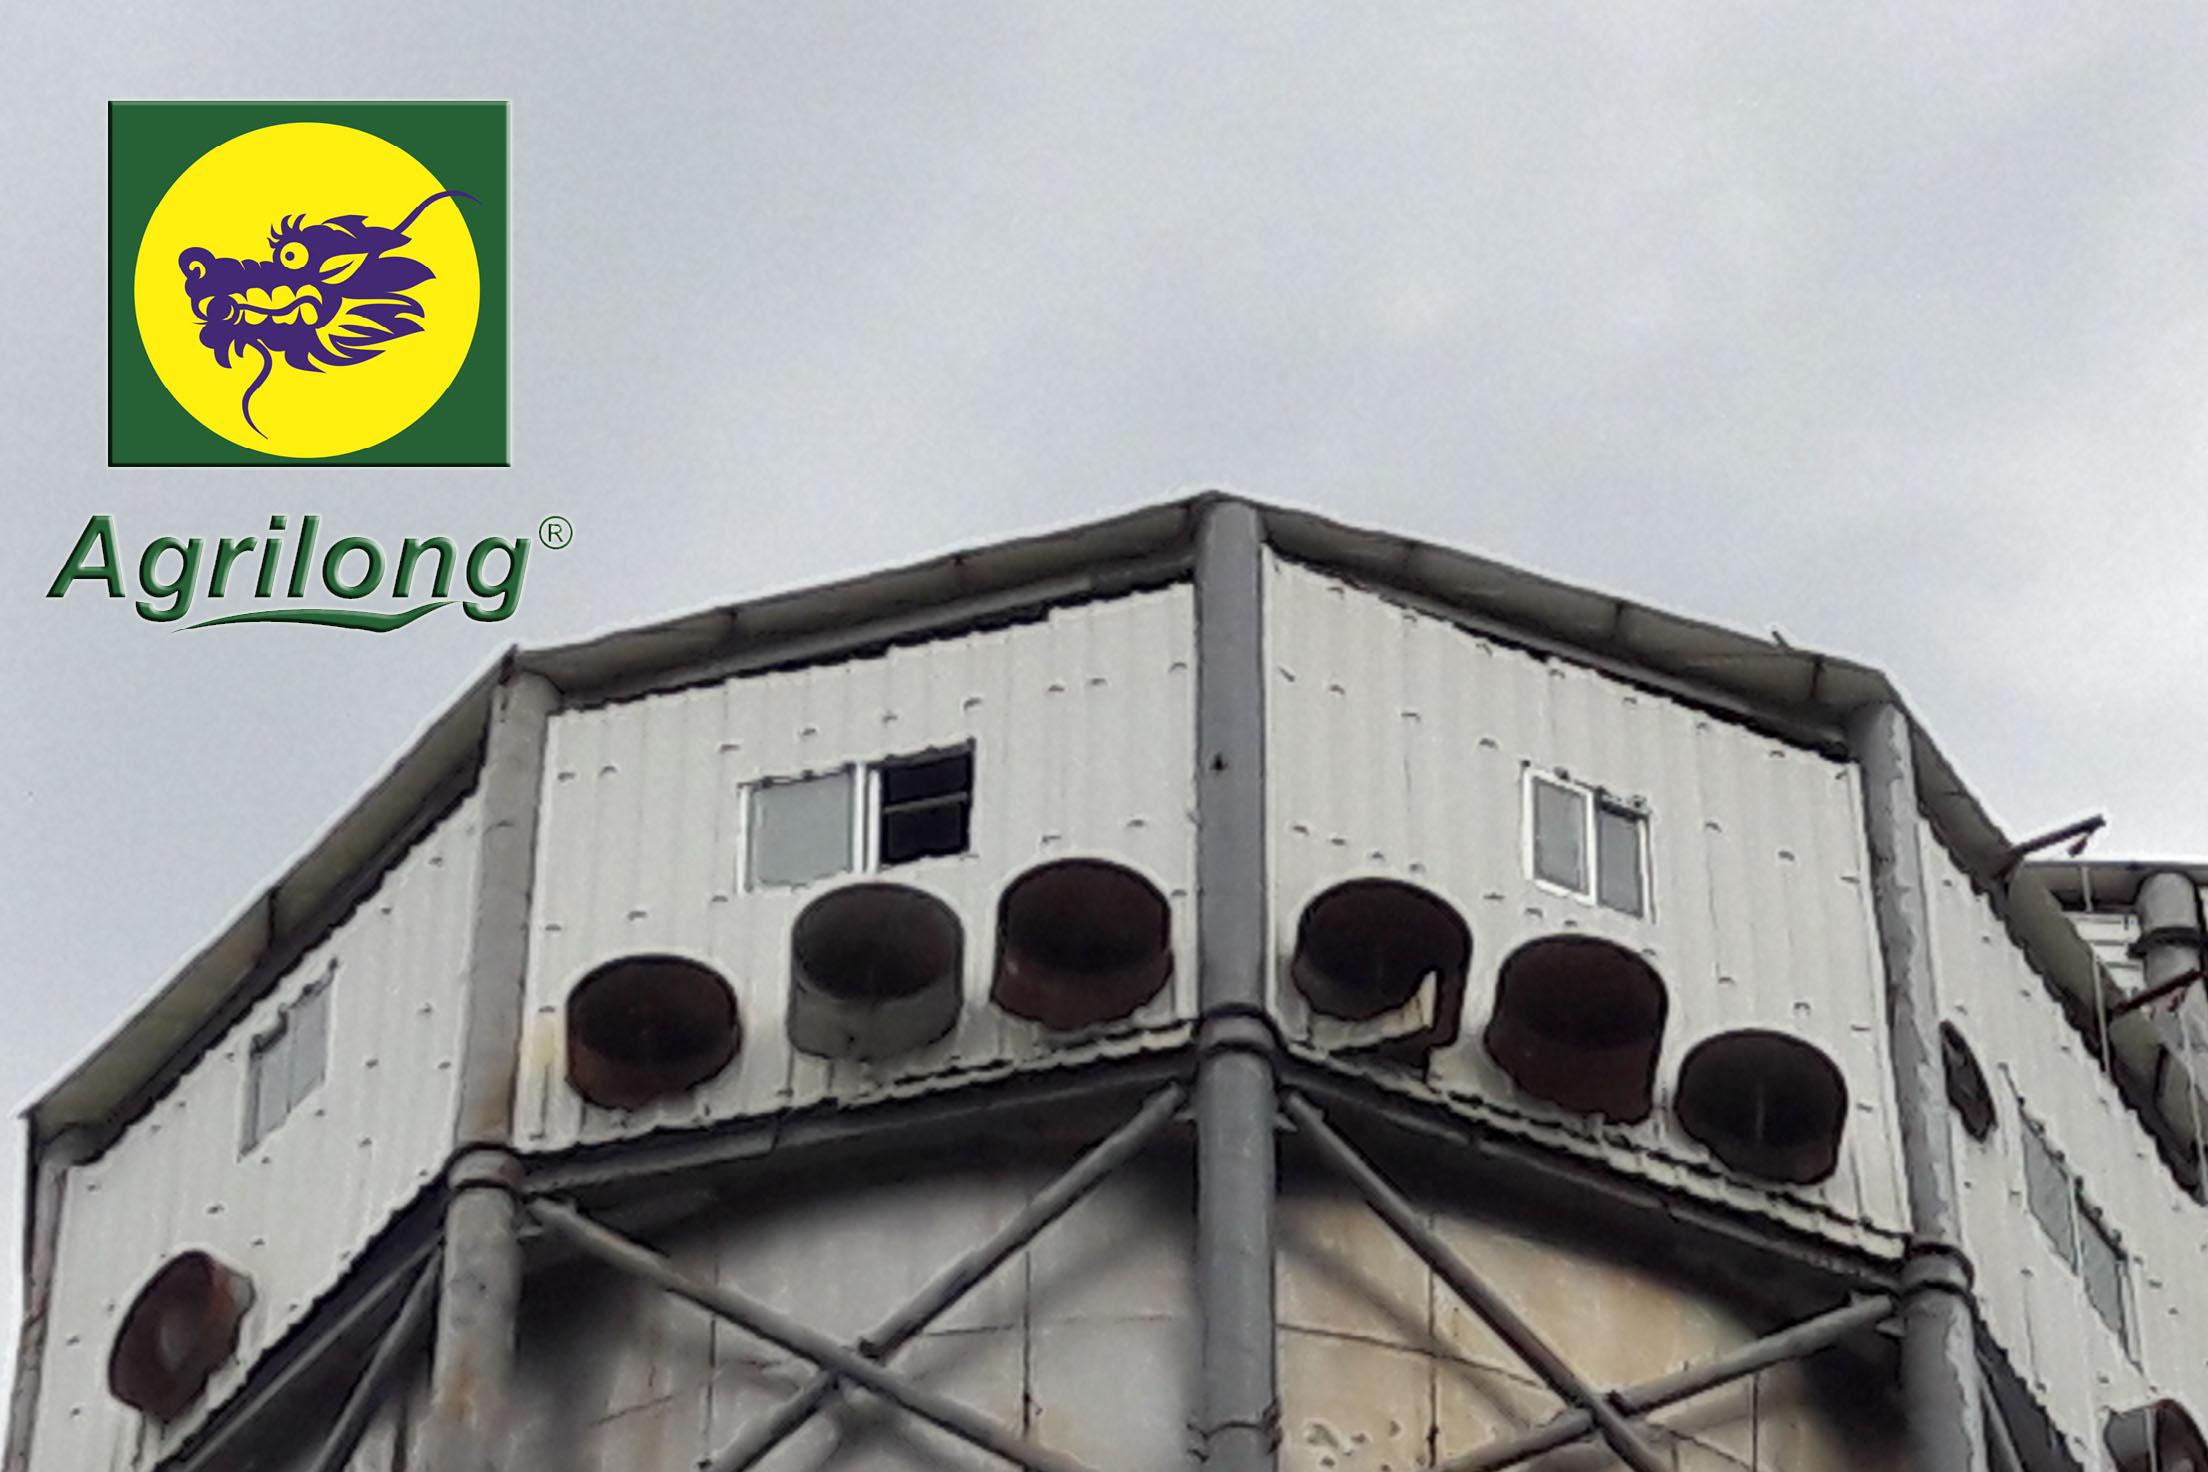 CONG_NGHE_NPK_THAP_CAO_AGRILONG5